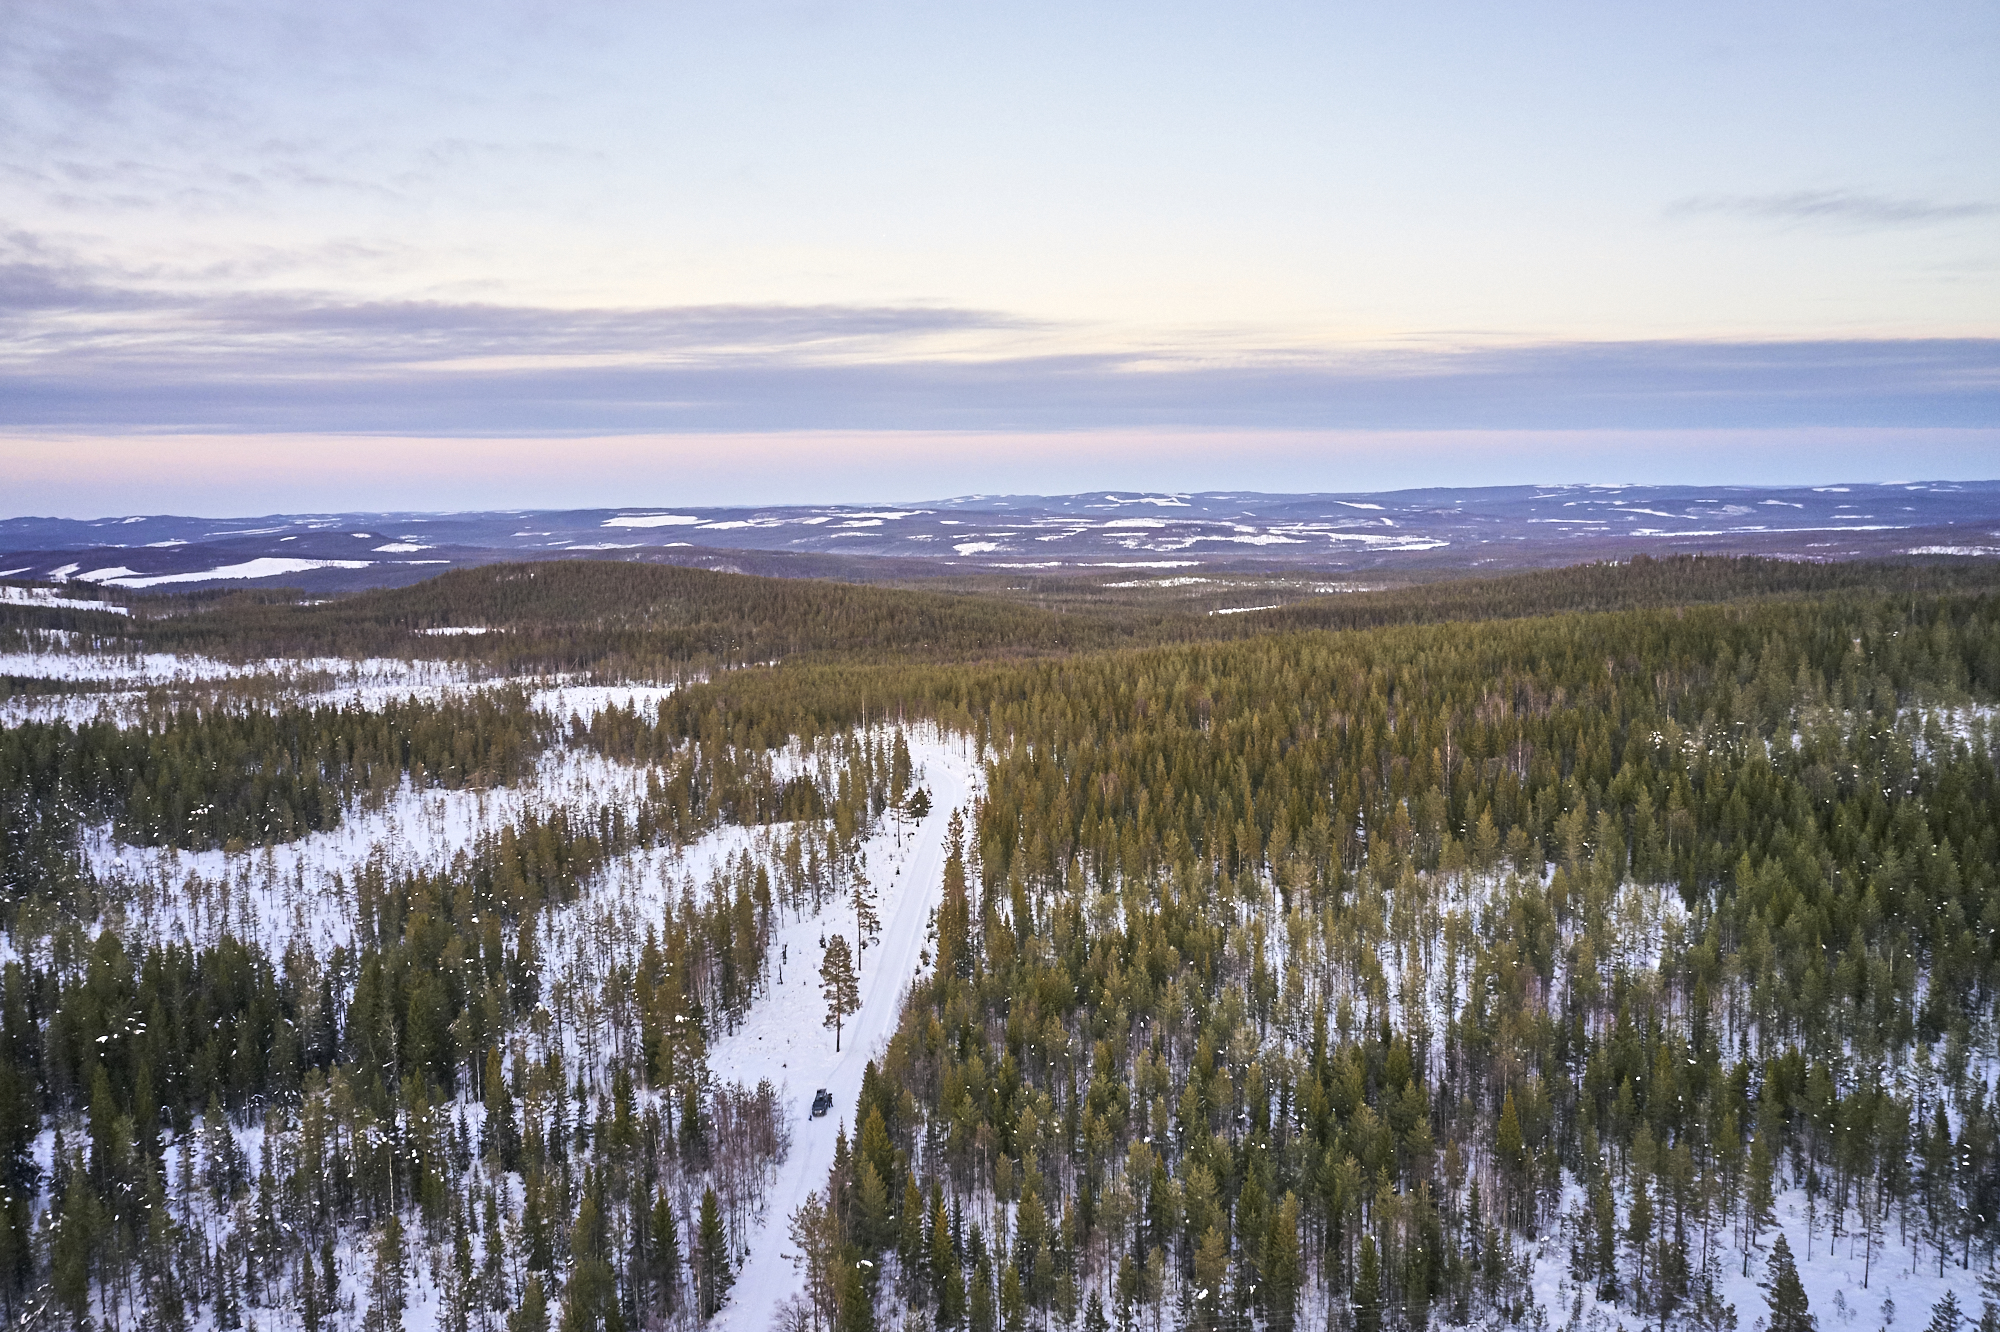 Zweden-2018-DJI_0273.jpg